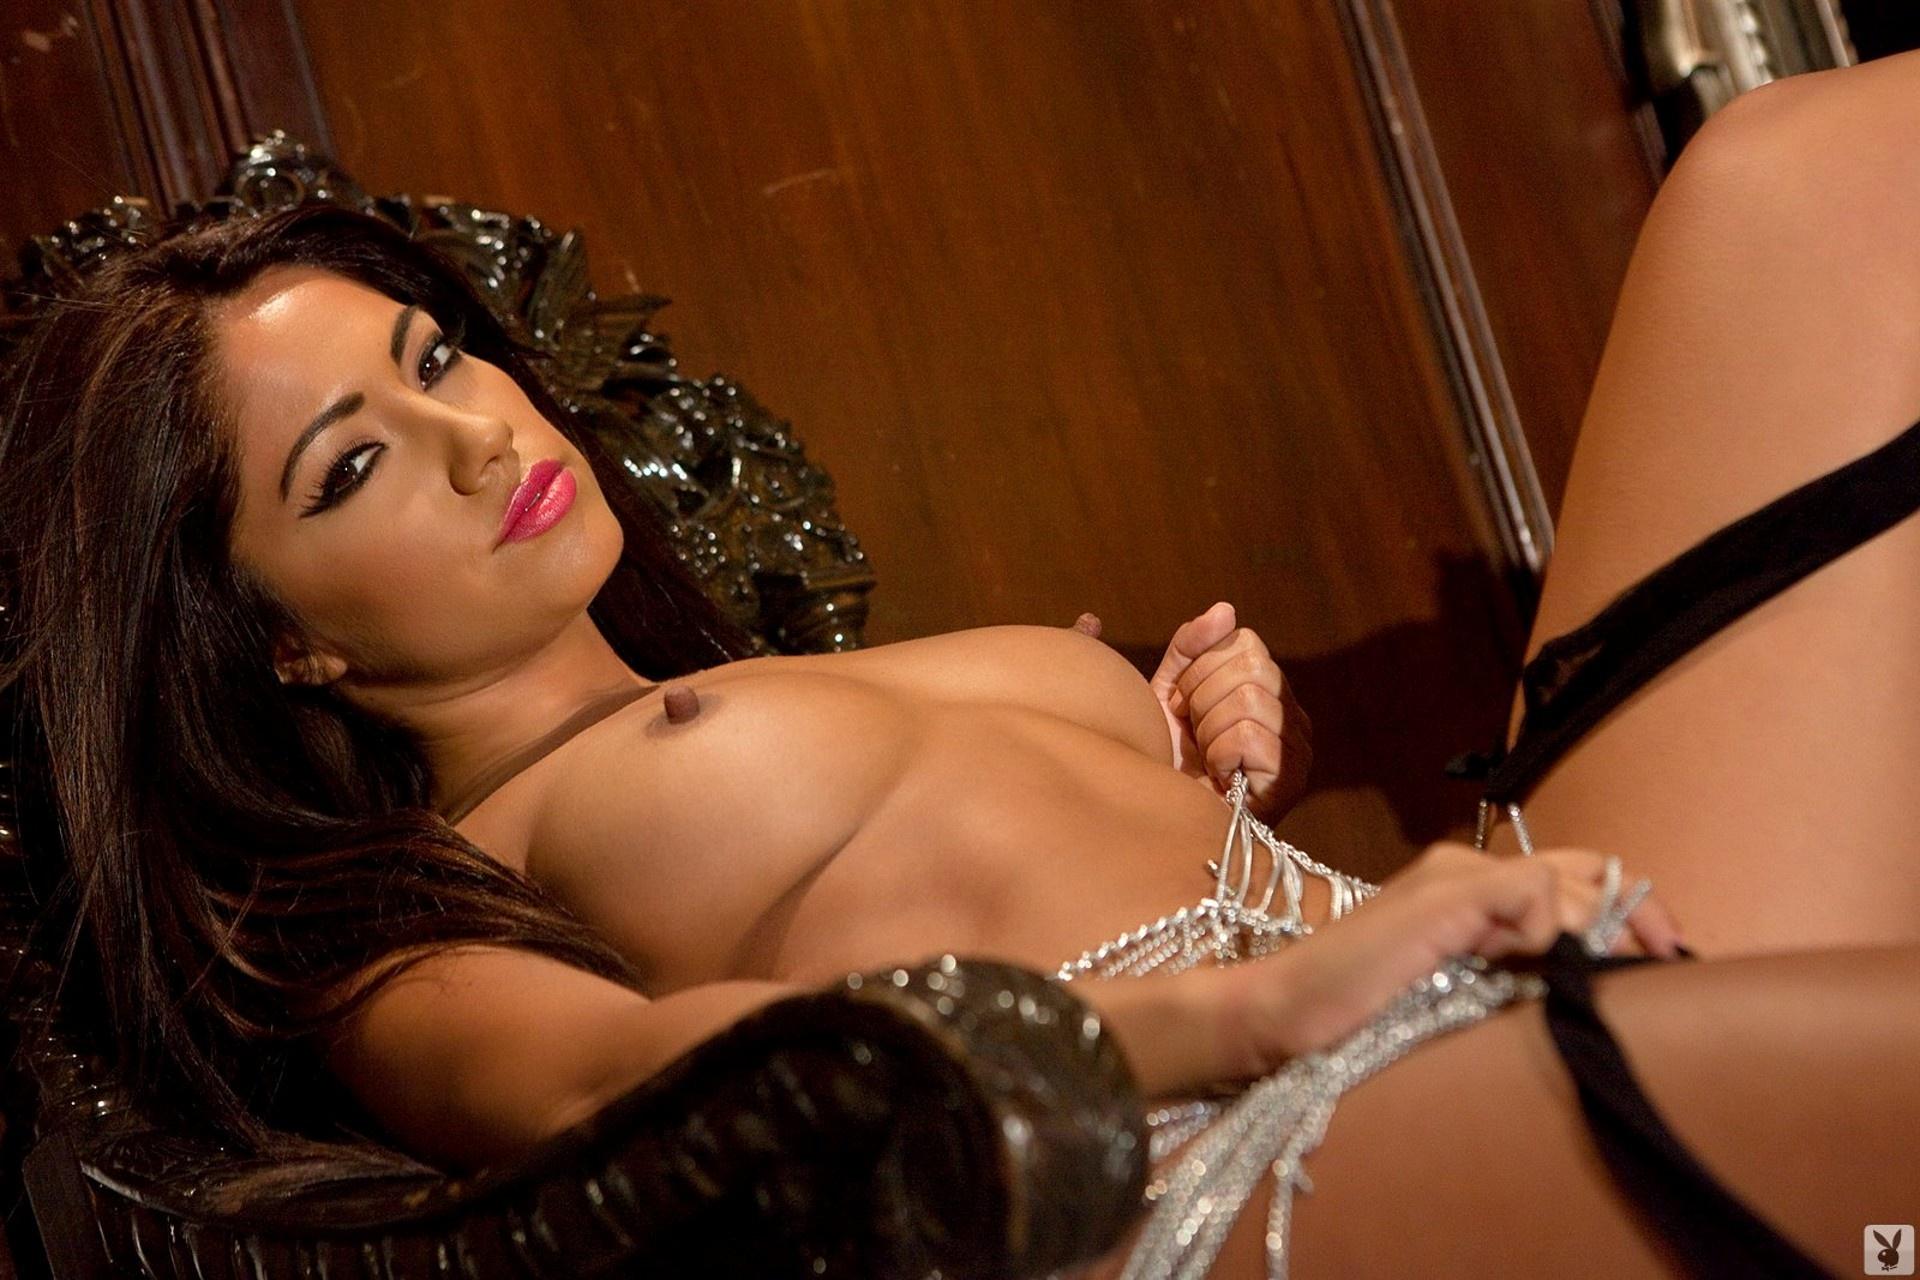 Perhaps Jessica burciaga naked nude topless